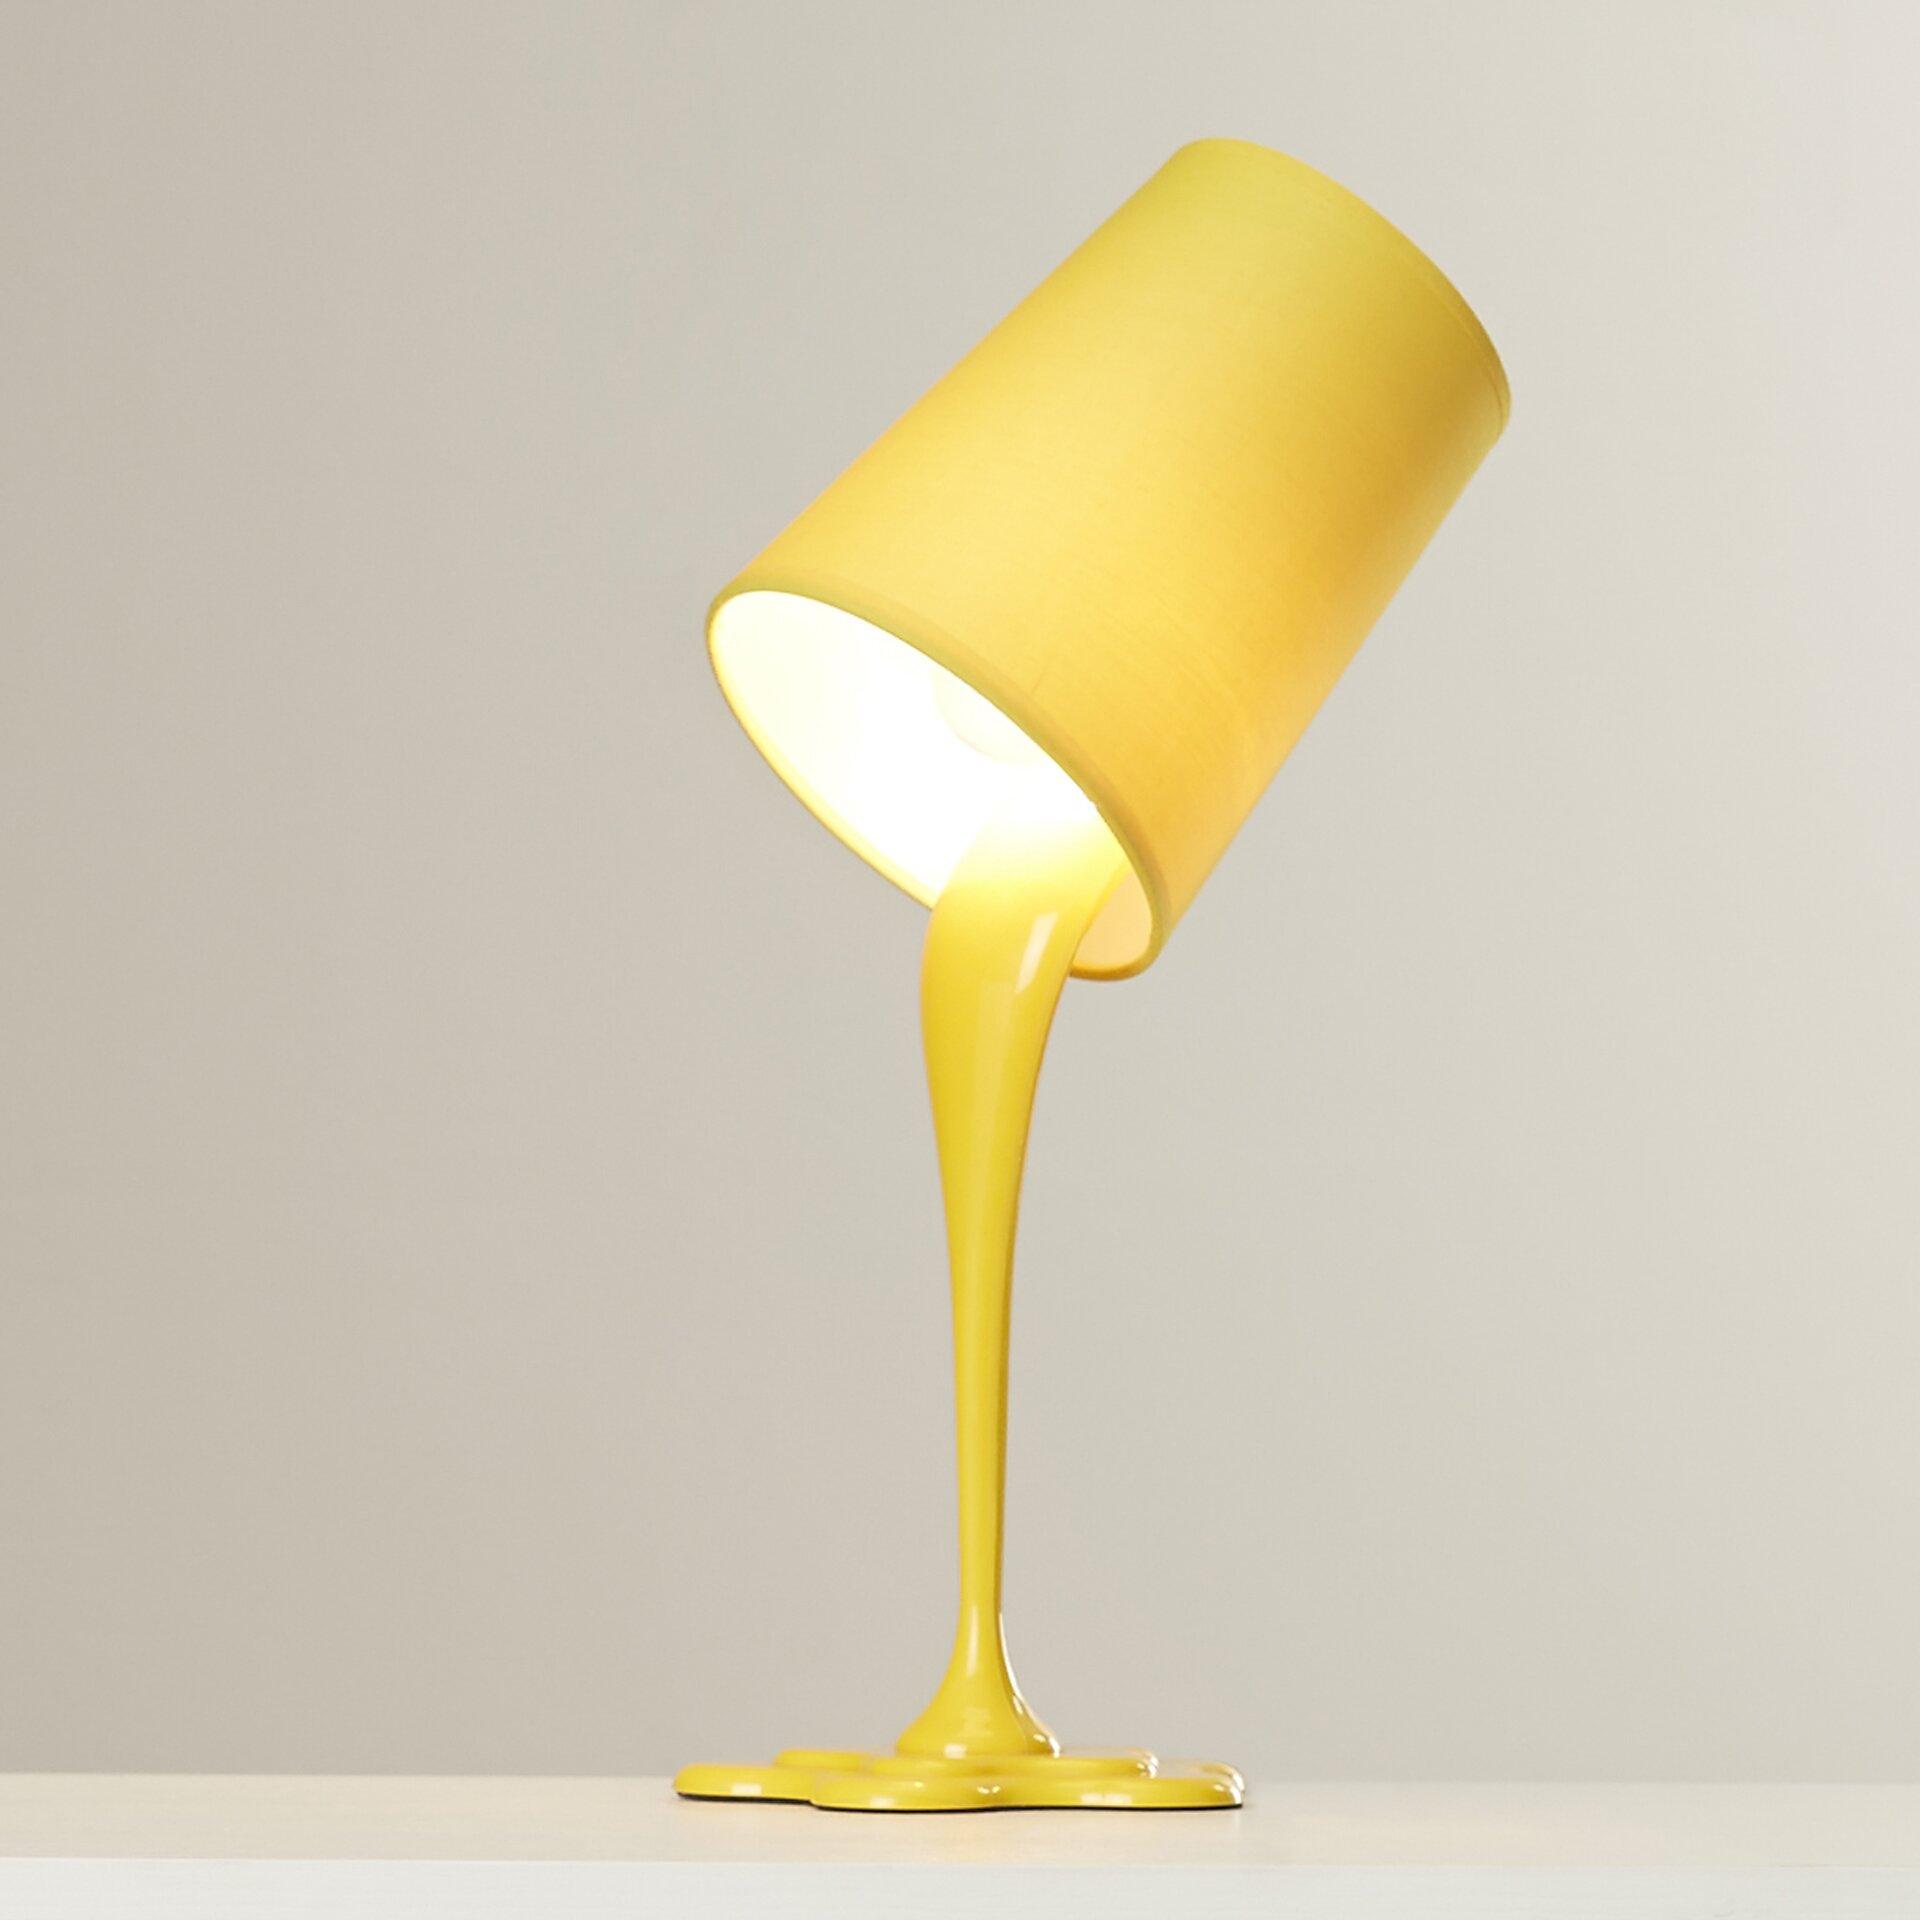 Viv rae powers 155quot h table lamp reviews wayfair for Gazzetta 5 light table lamp